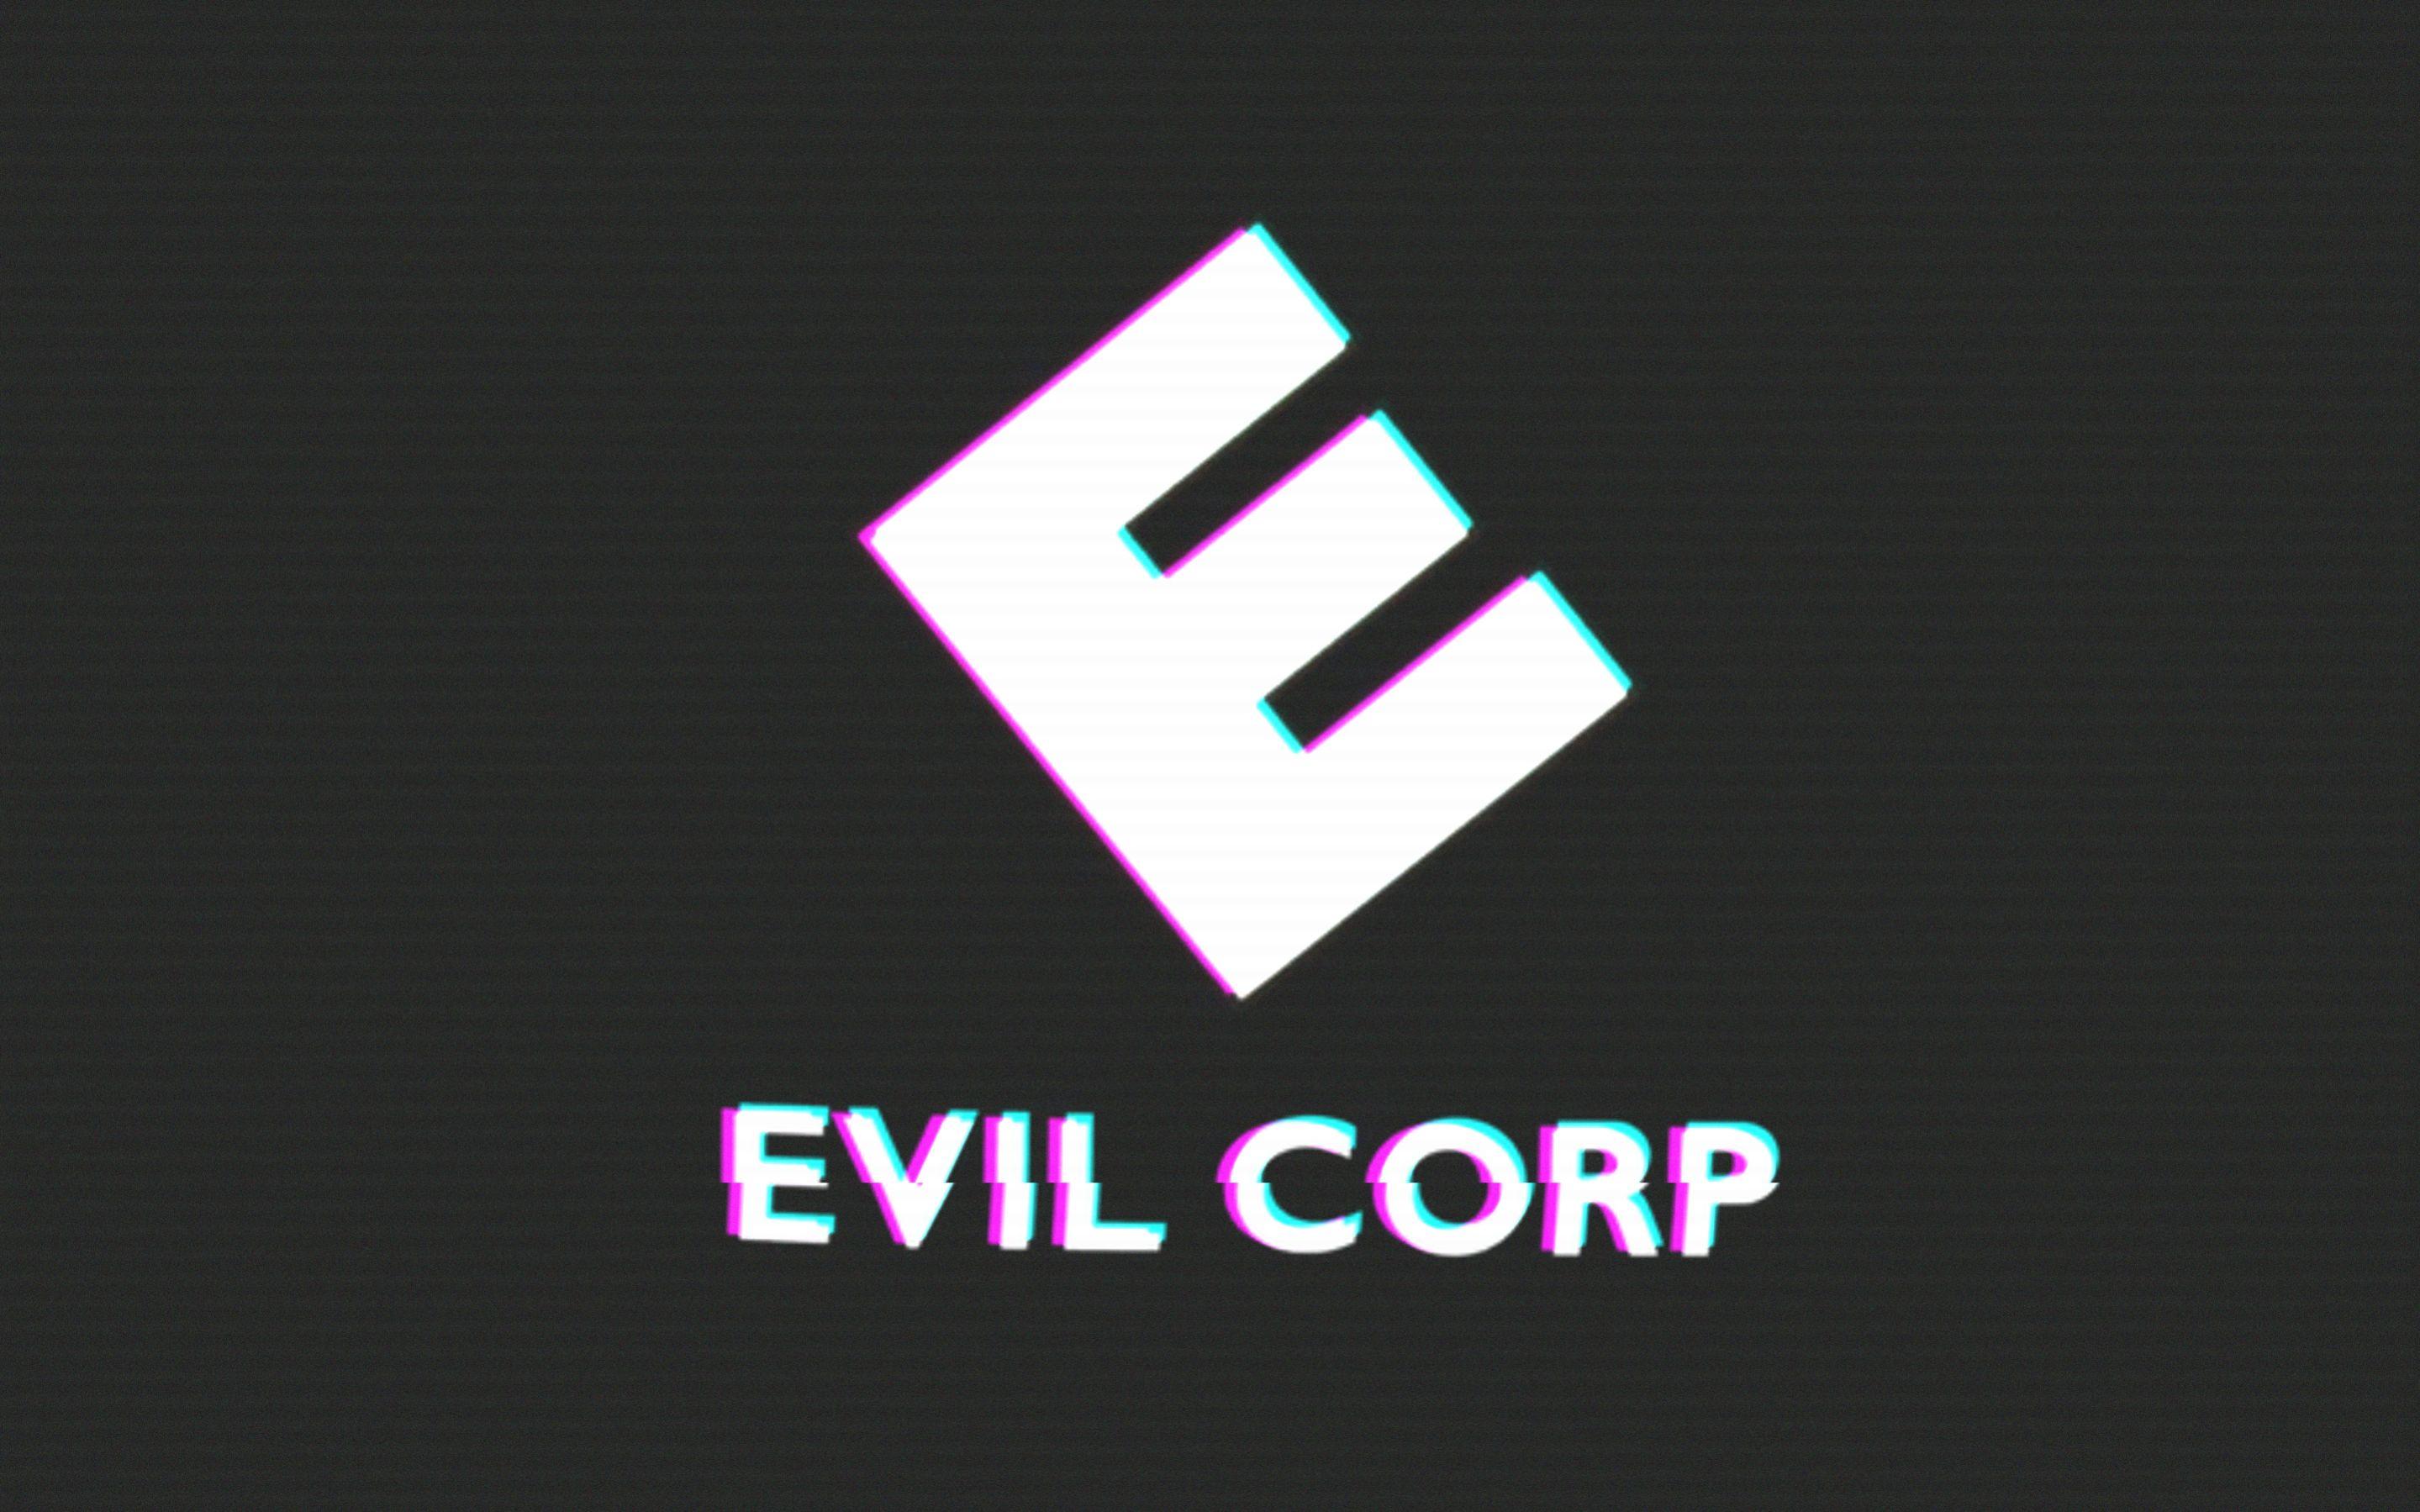 Veolia/Transdev: 'Evil Corp'